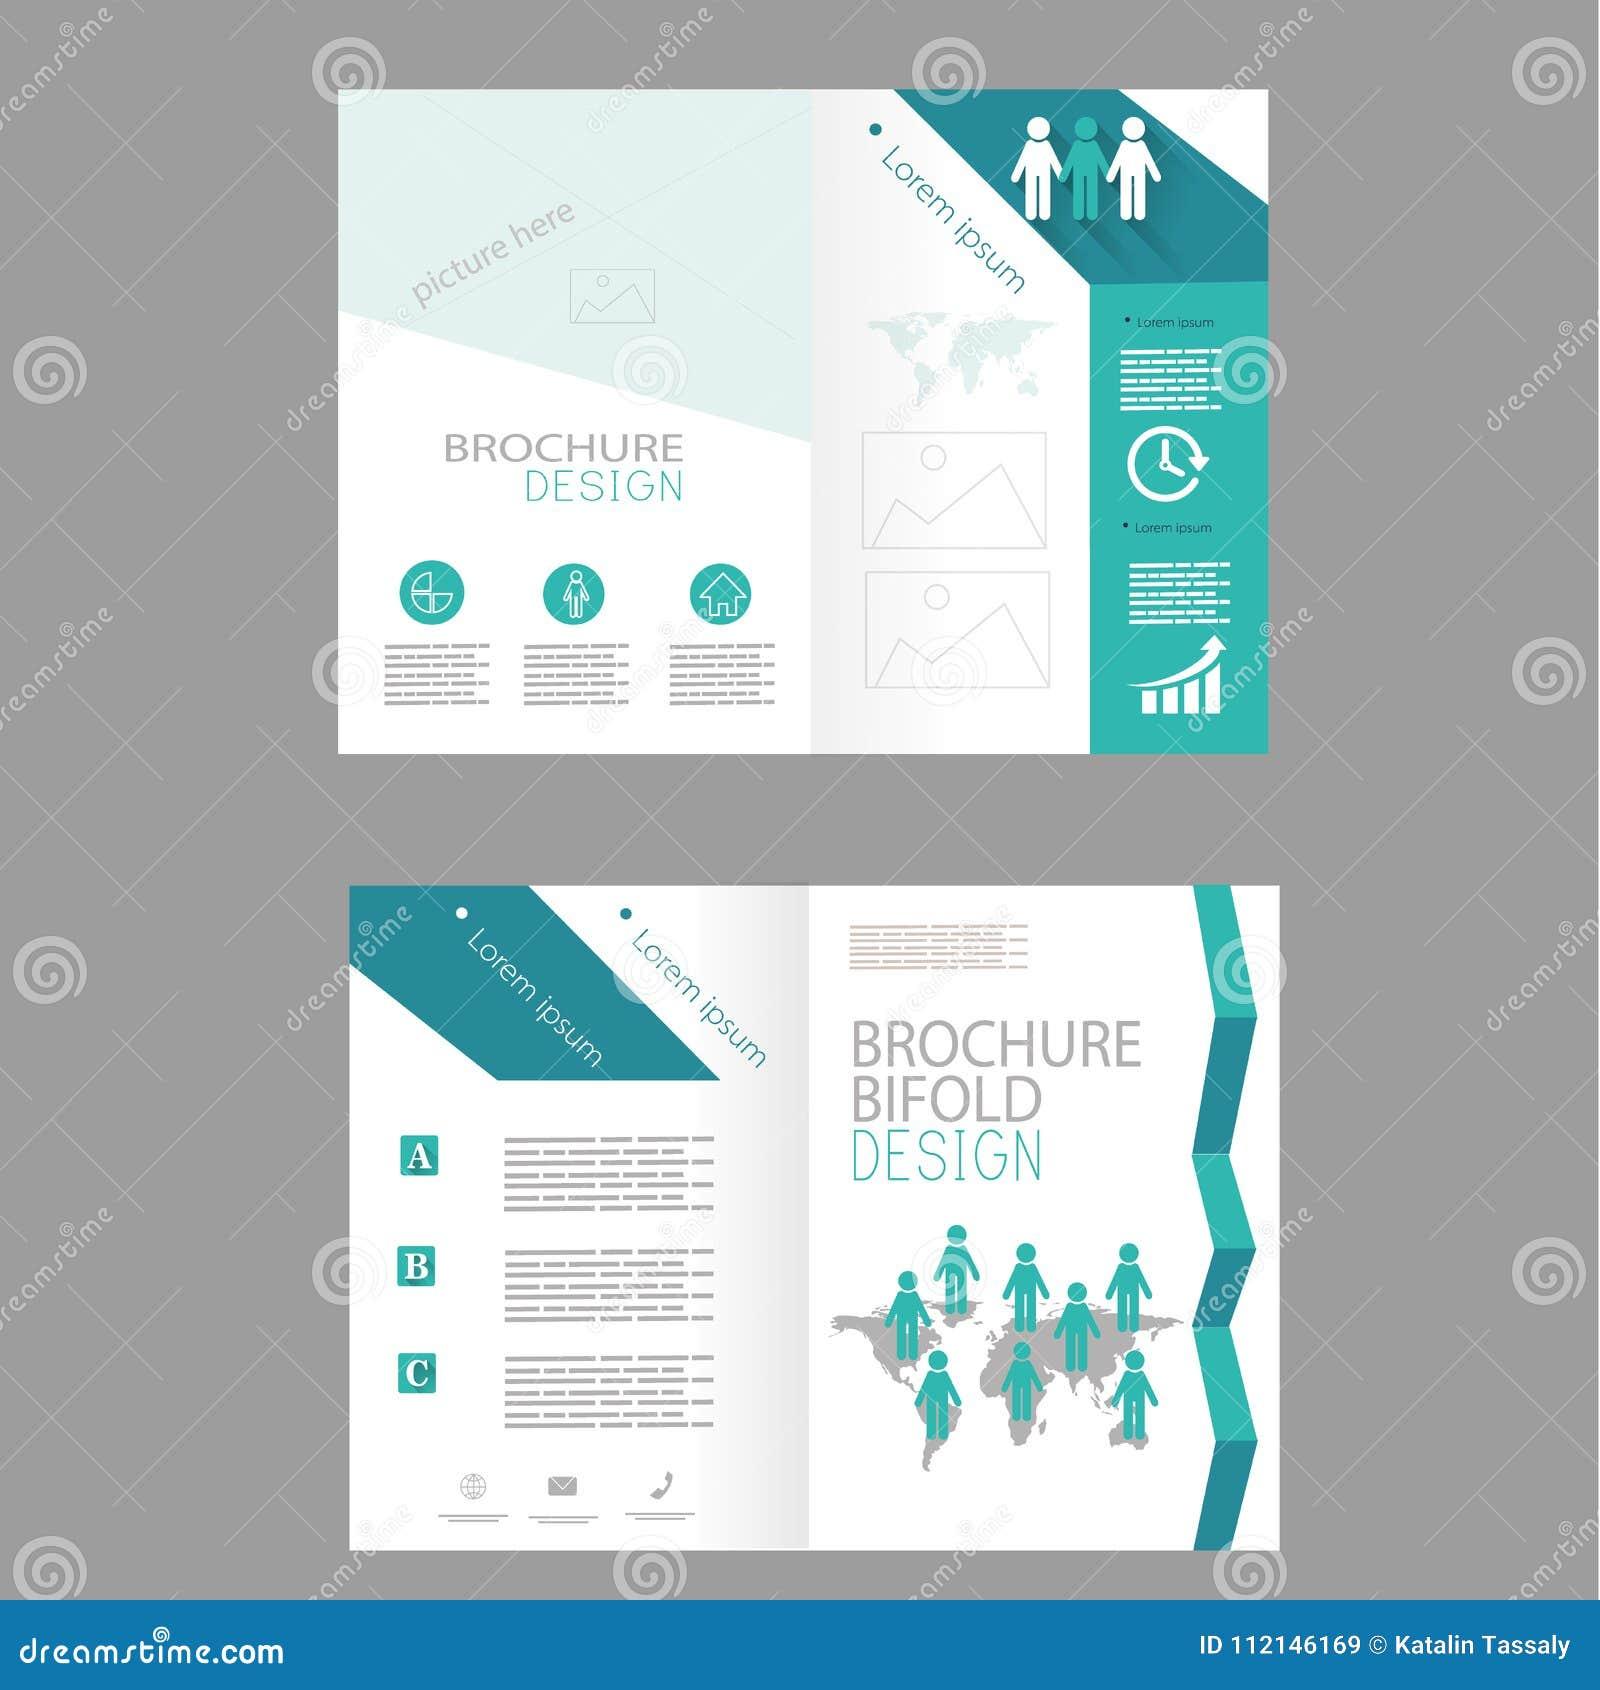 Brochure Template Flyer Design For Business Purposes Elegant